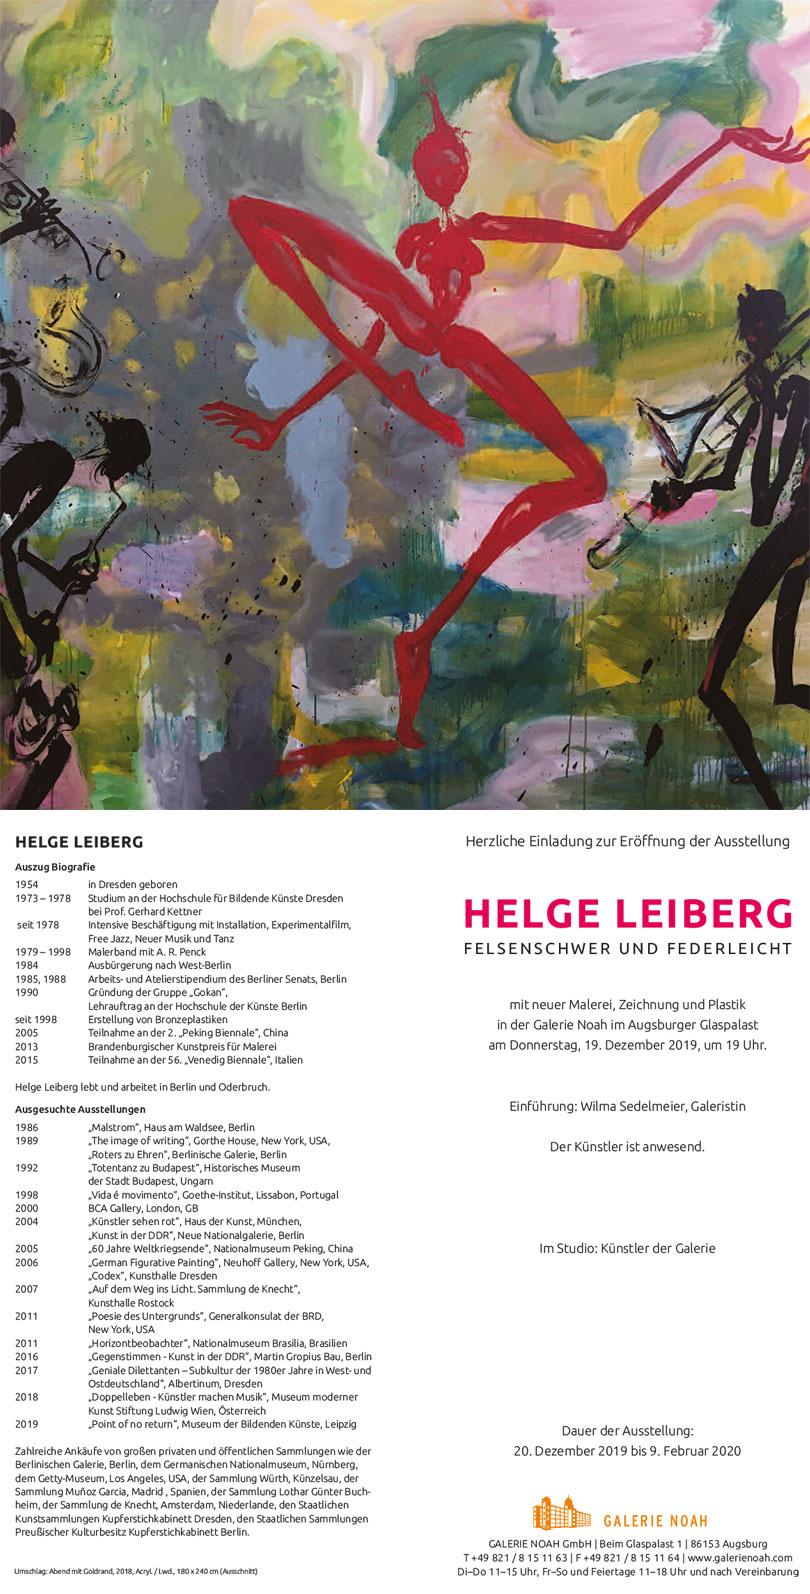 Helge Leiberg